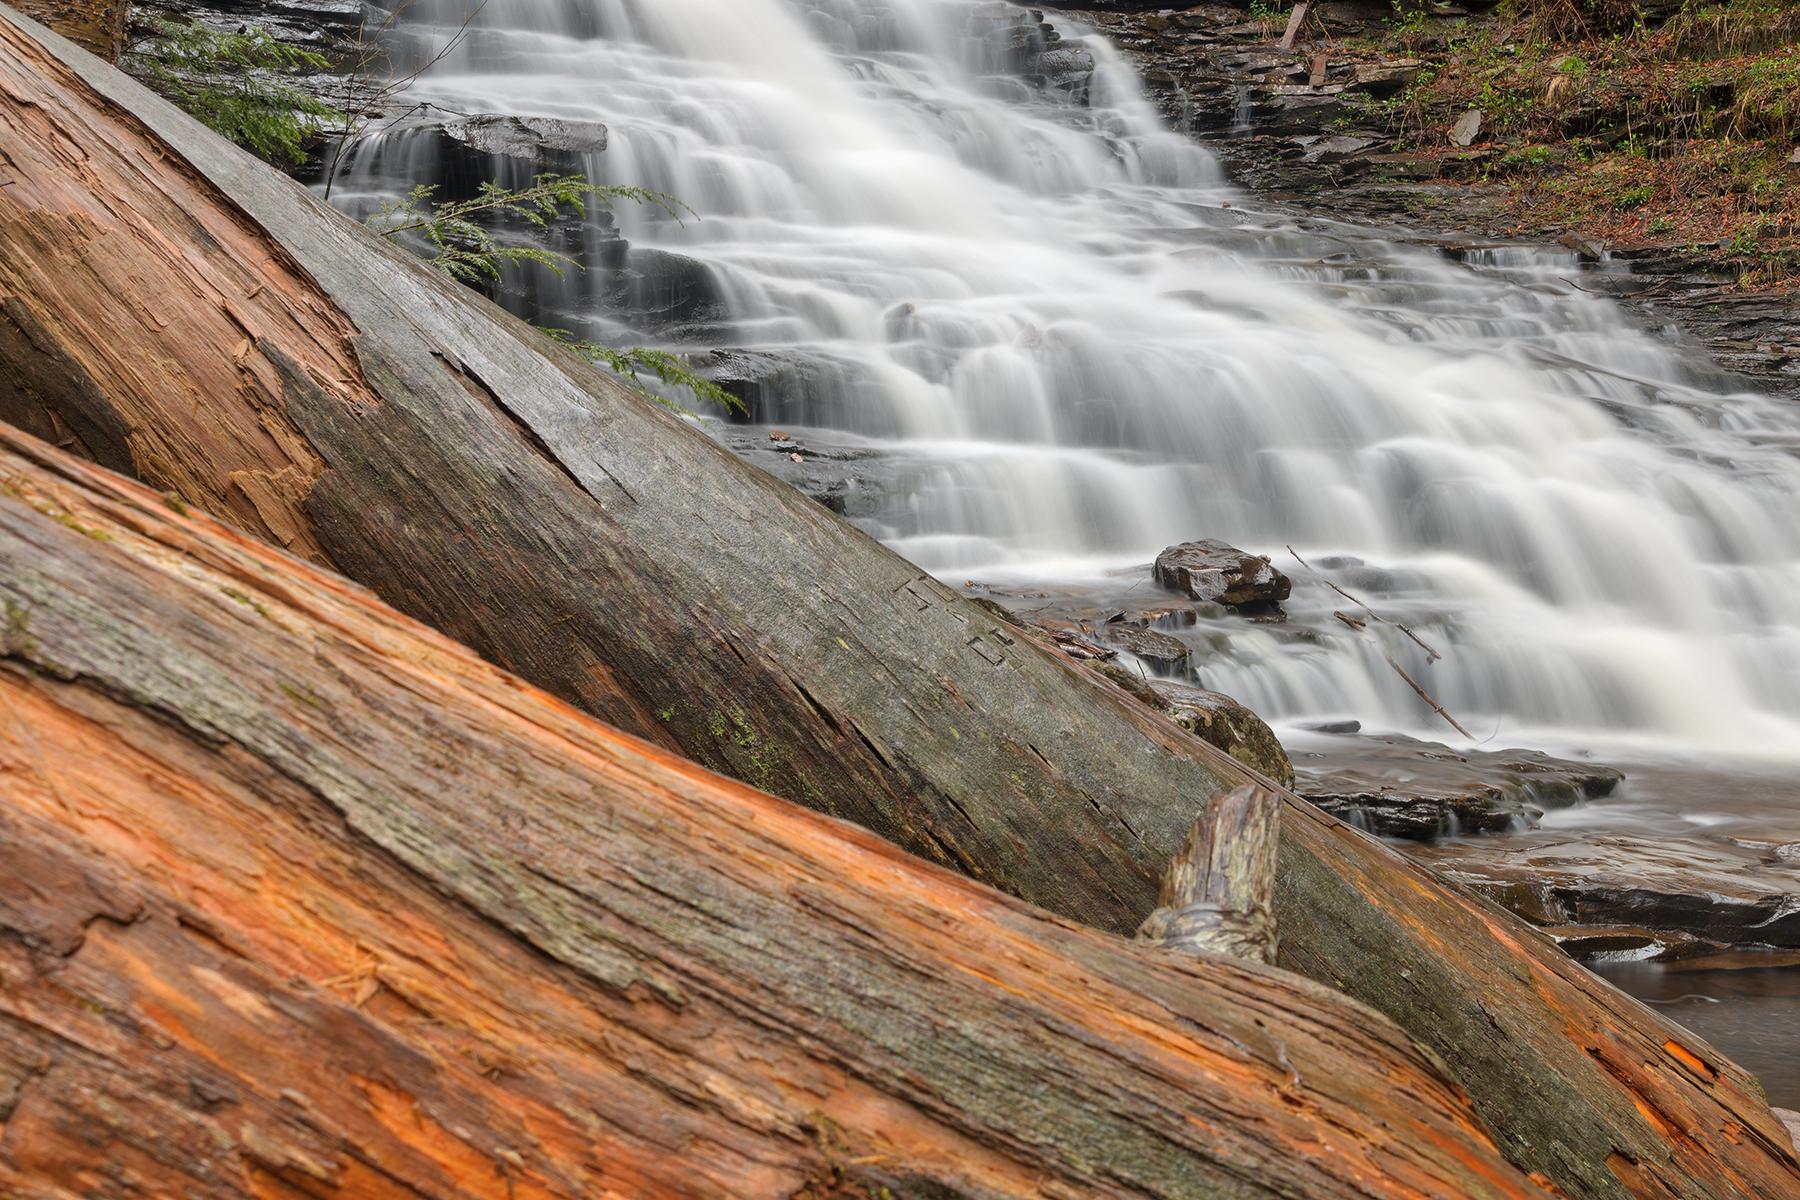 F.l. ricketts log falls - hdr photo